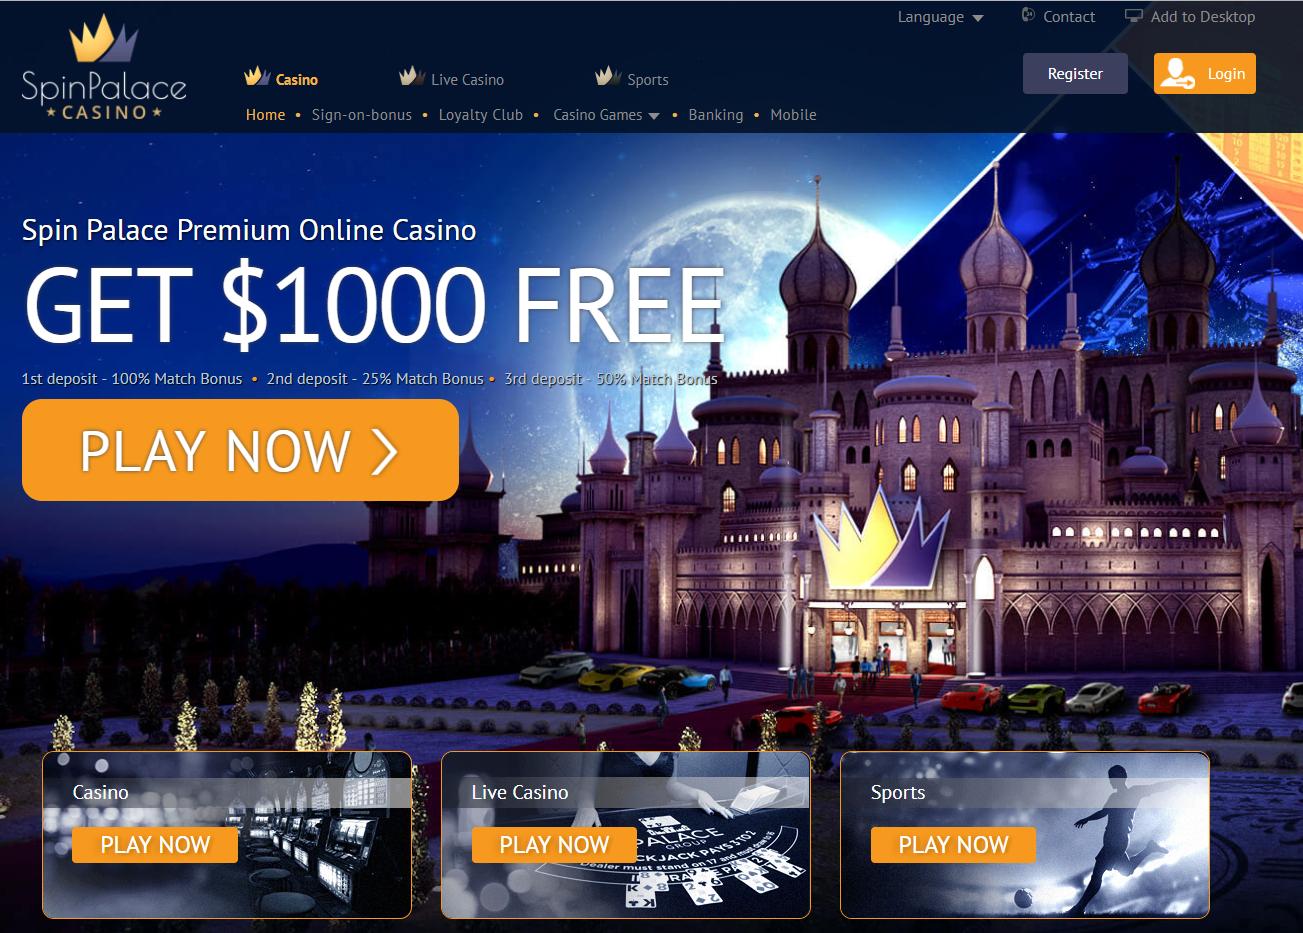 Spin Palace casino India